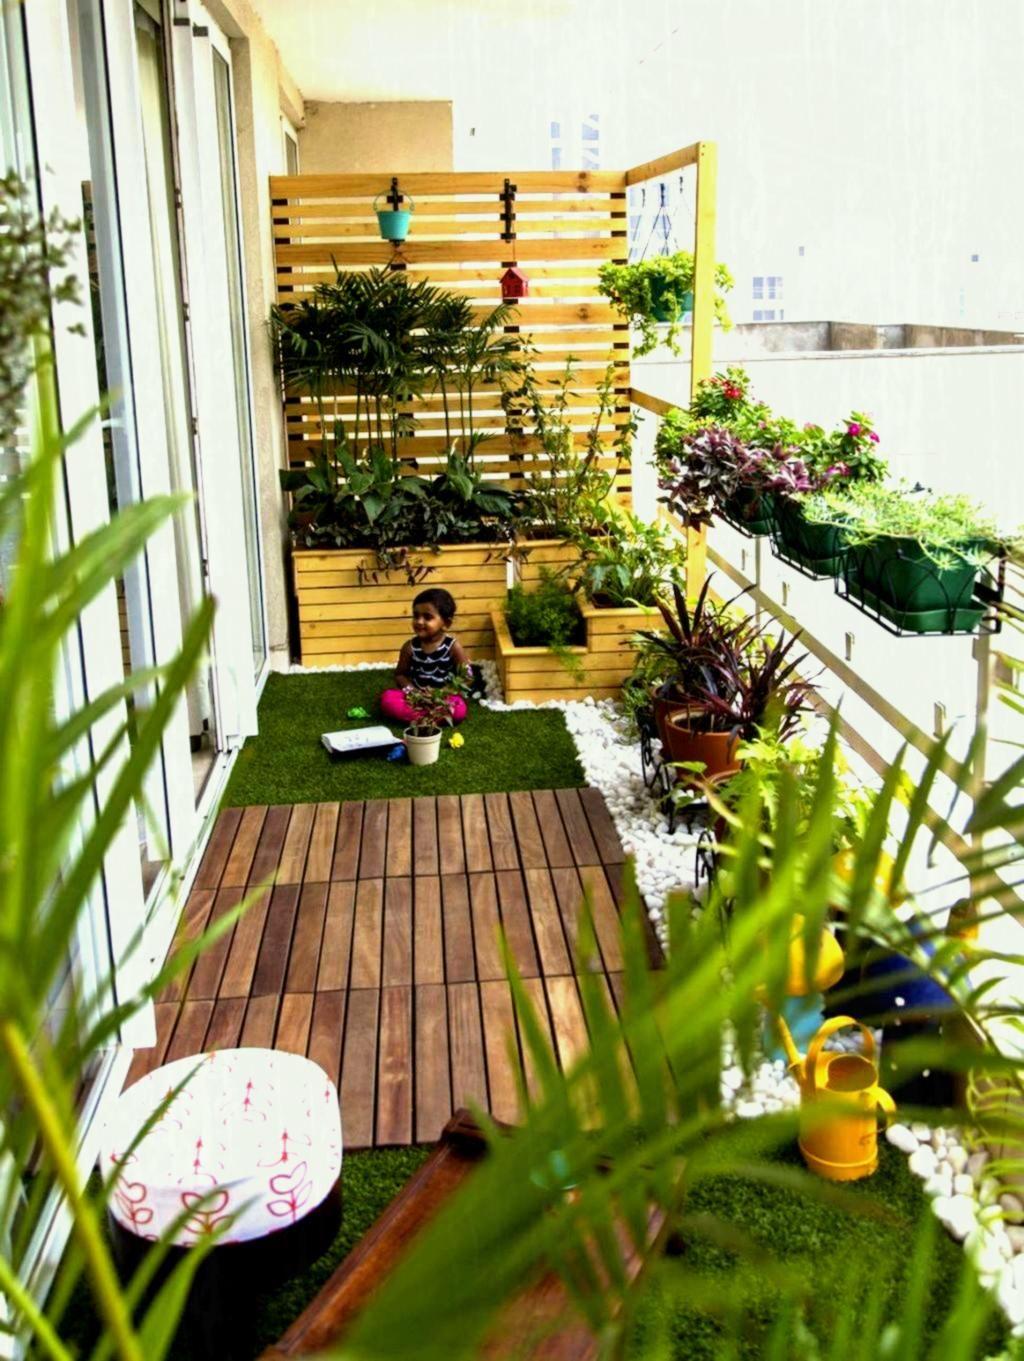 10 Apartment Patio Garden Design Ideas, Most Elegant as well as ...